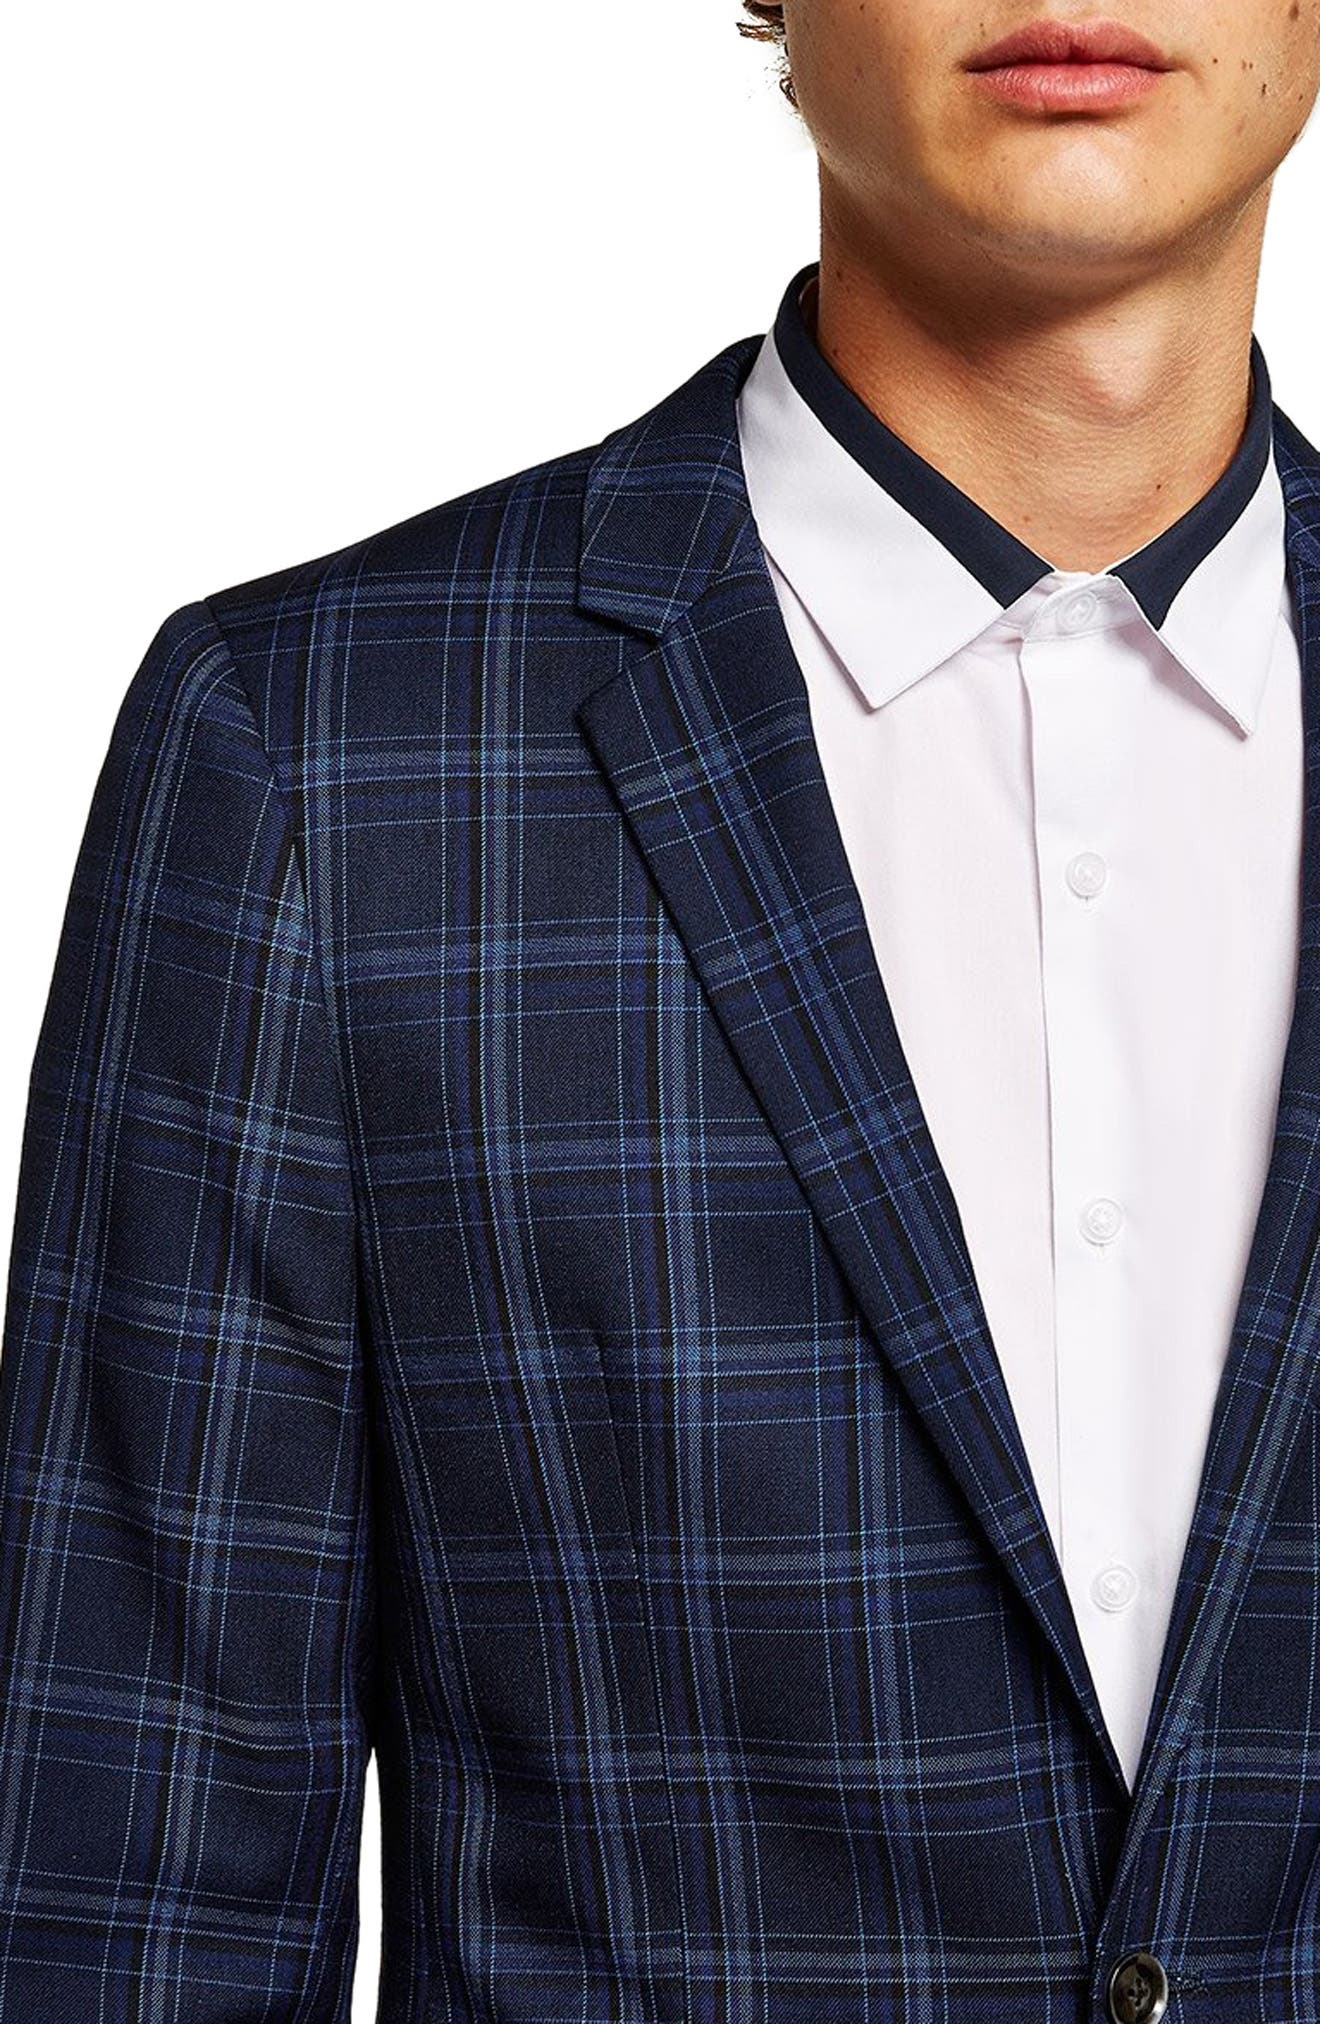 TOPMAN, Skinny Fit Check Suit Jacket, Alternate thumbnail 3, color, 400